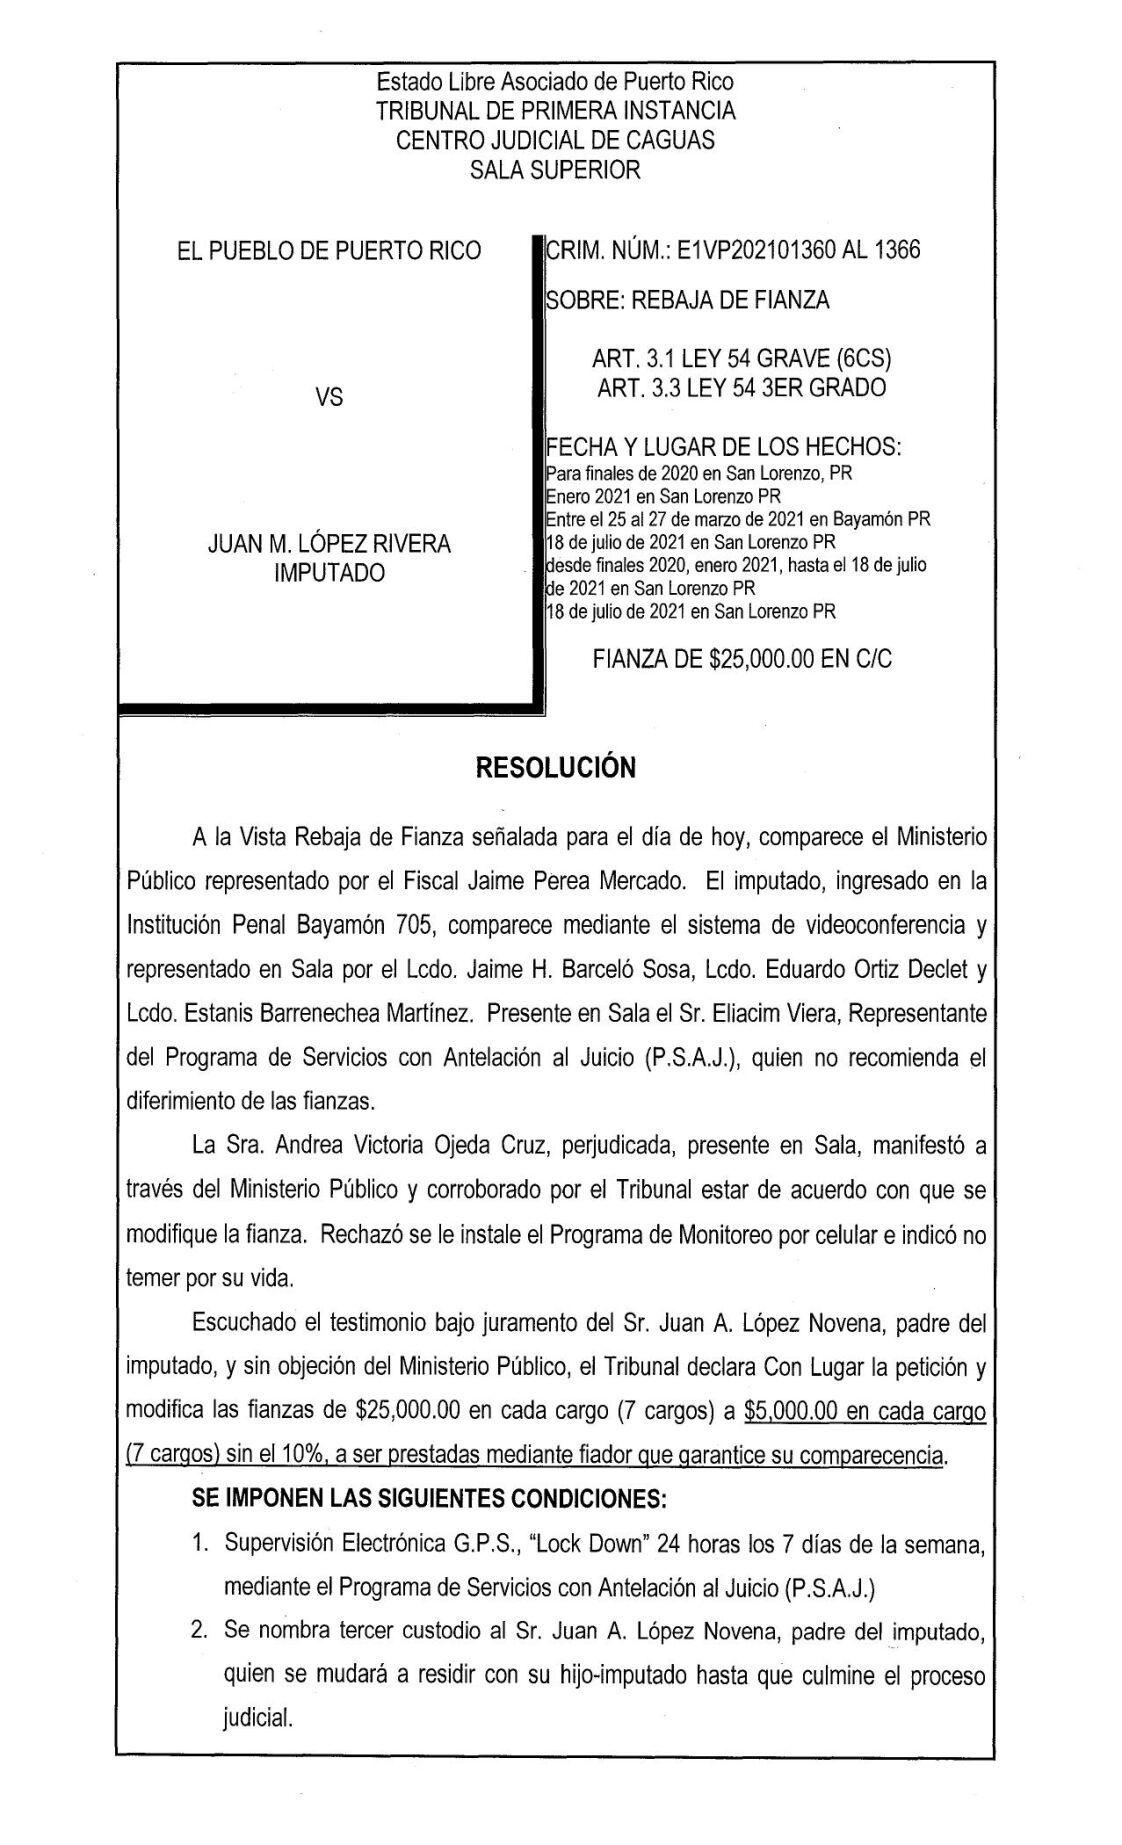 E1VP202101360 - RES REB FIANZA 23 SEPT 2021.pdf